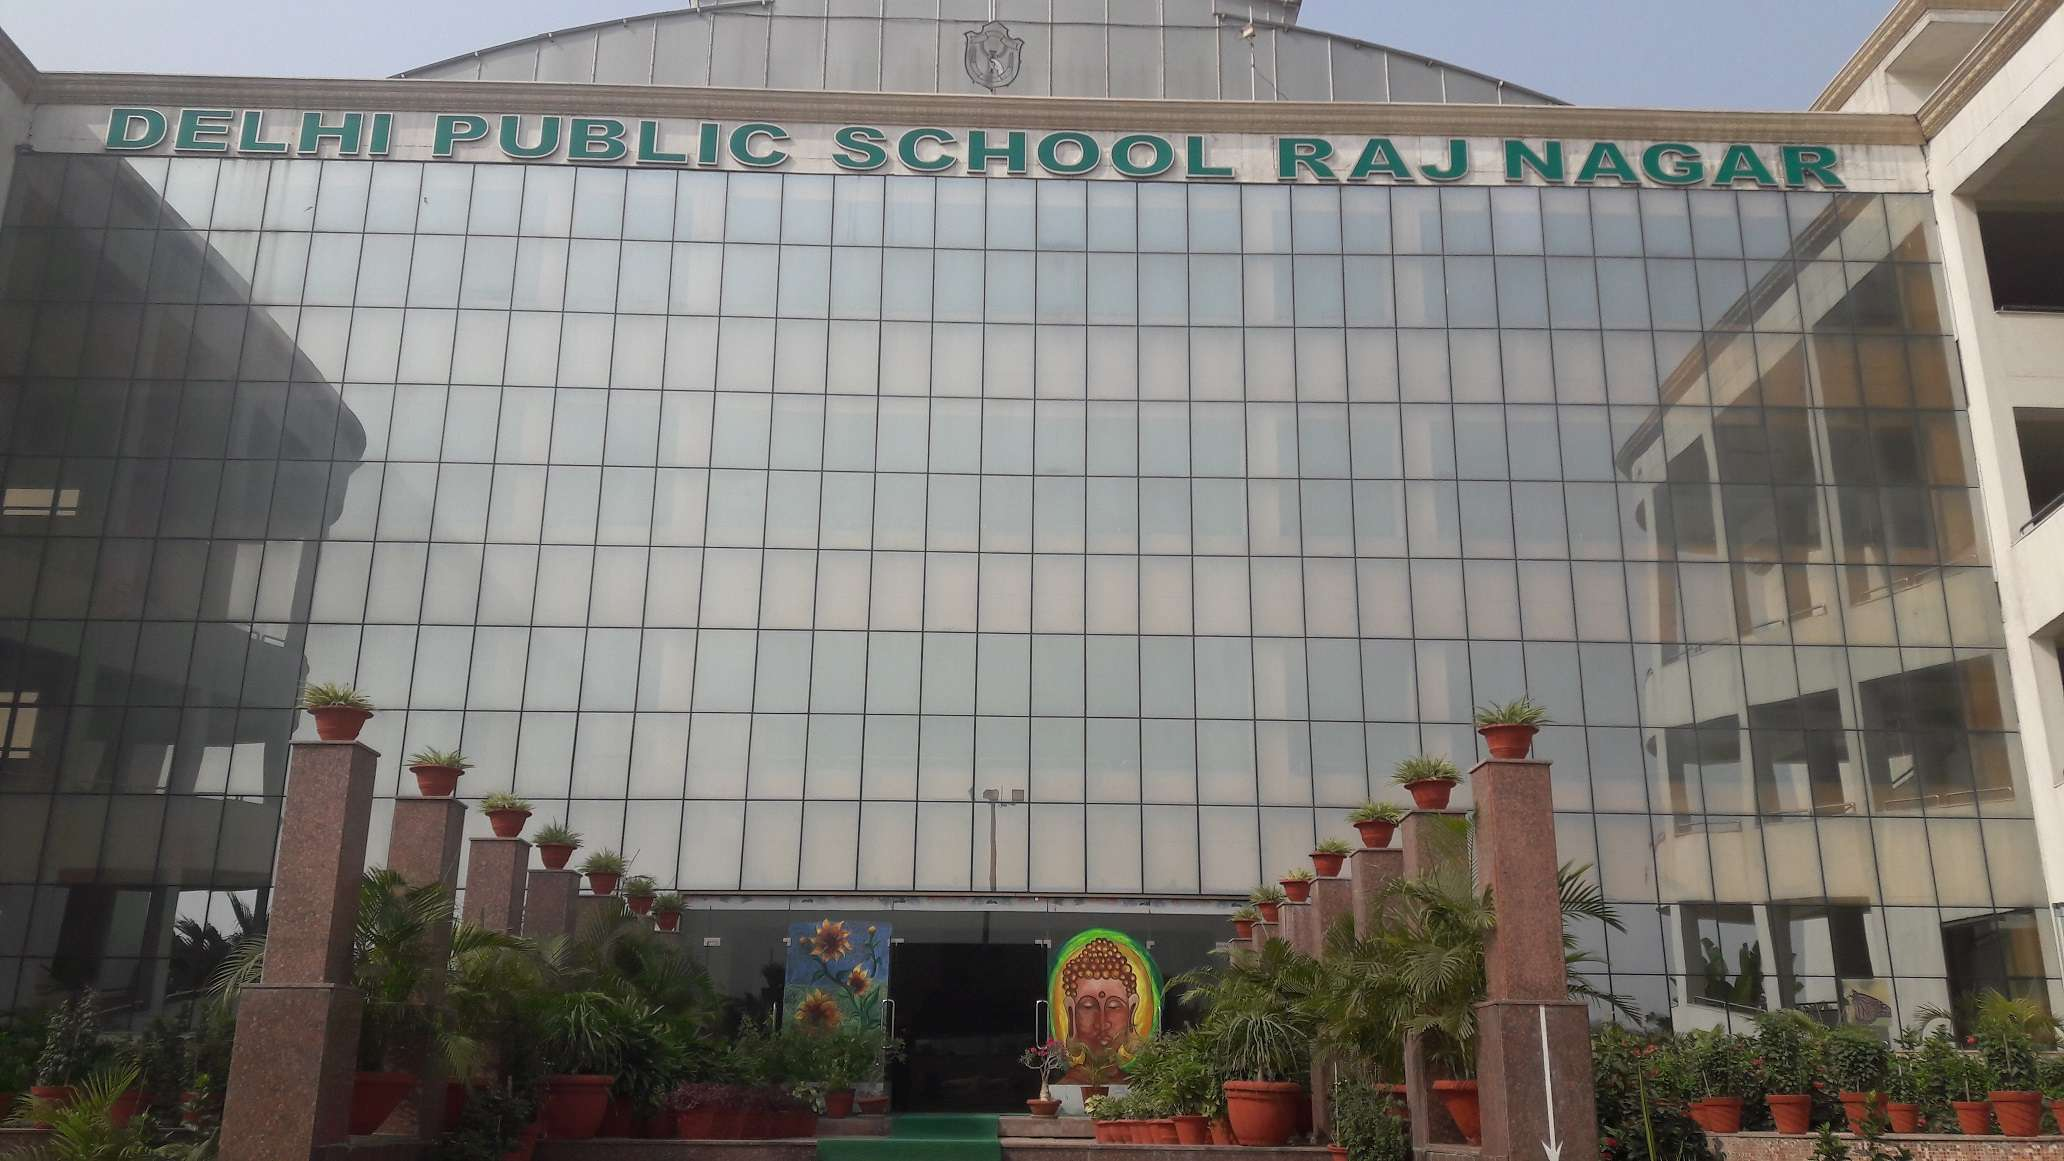 DELHI PUBLIC SCHOOL RAJ NAGAR NH 58 OPP SAIL GODOWN 2131403